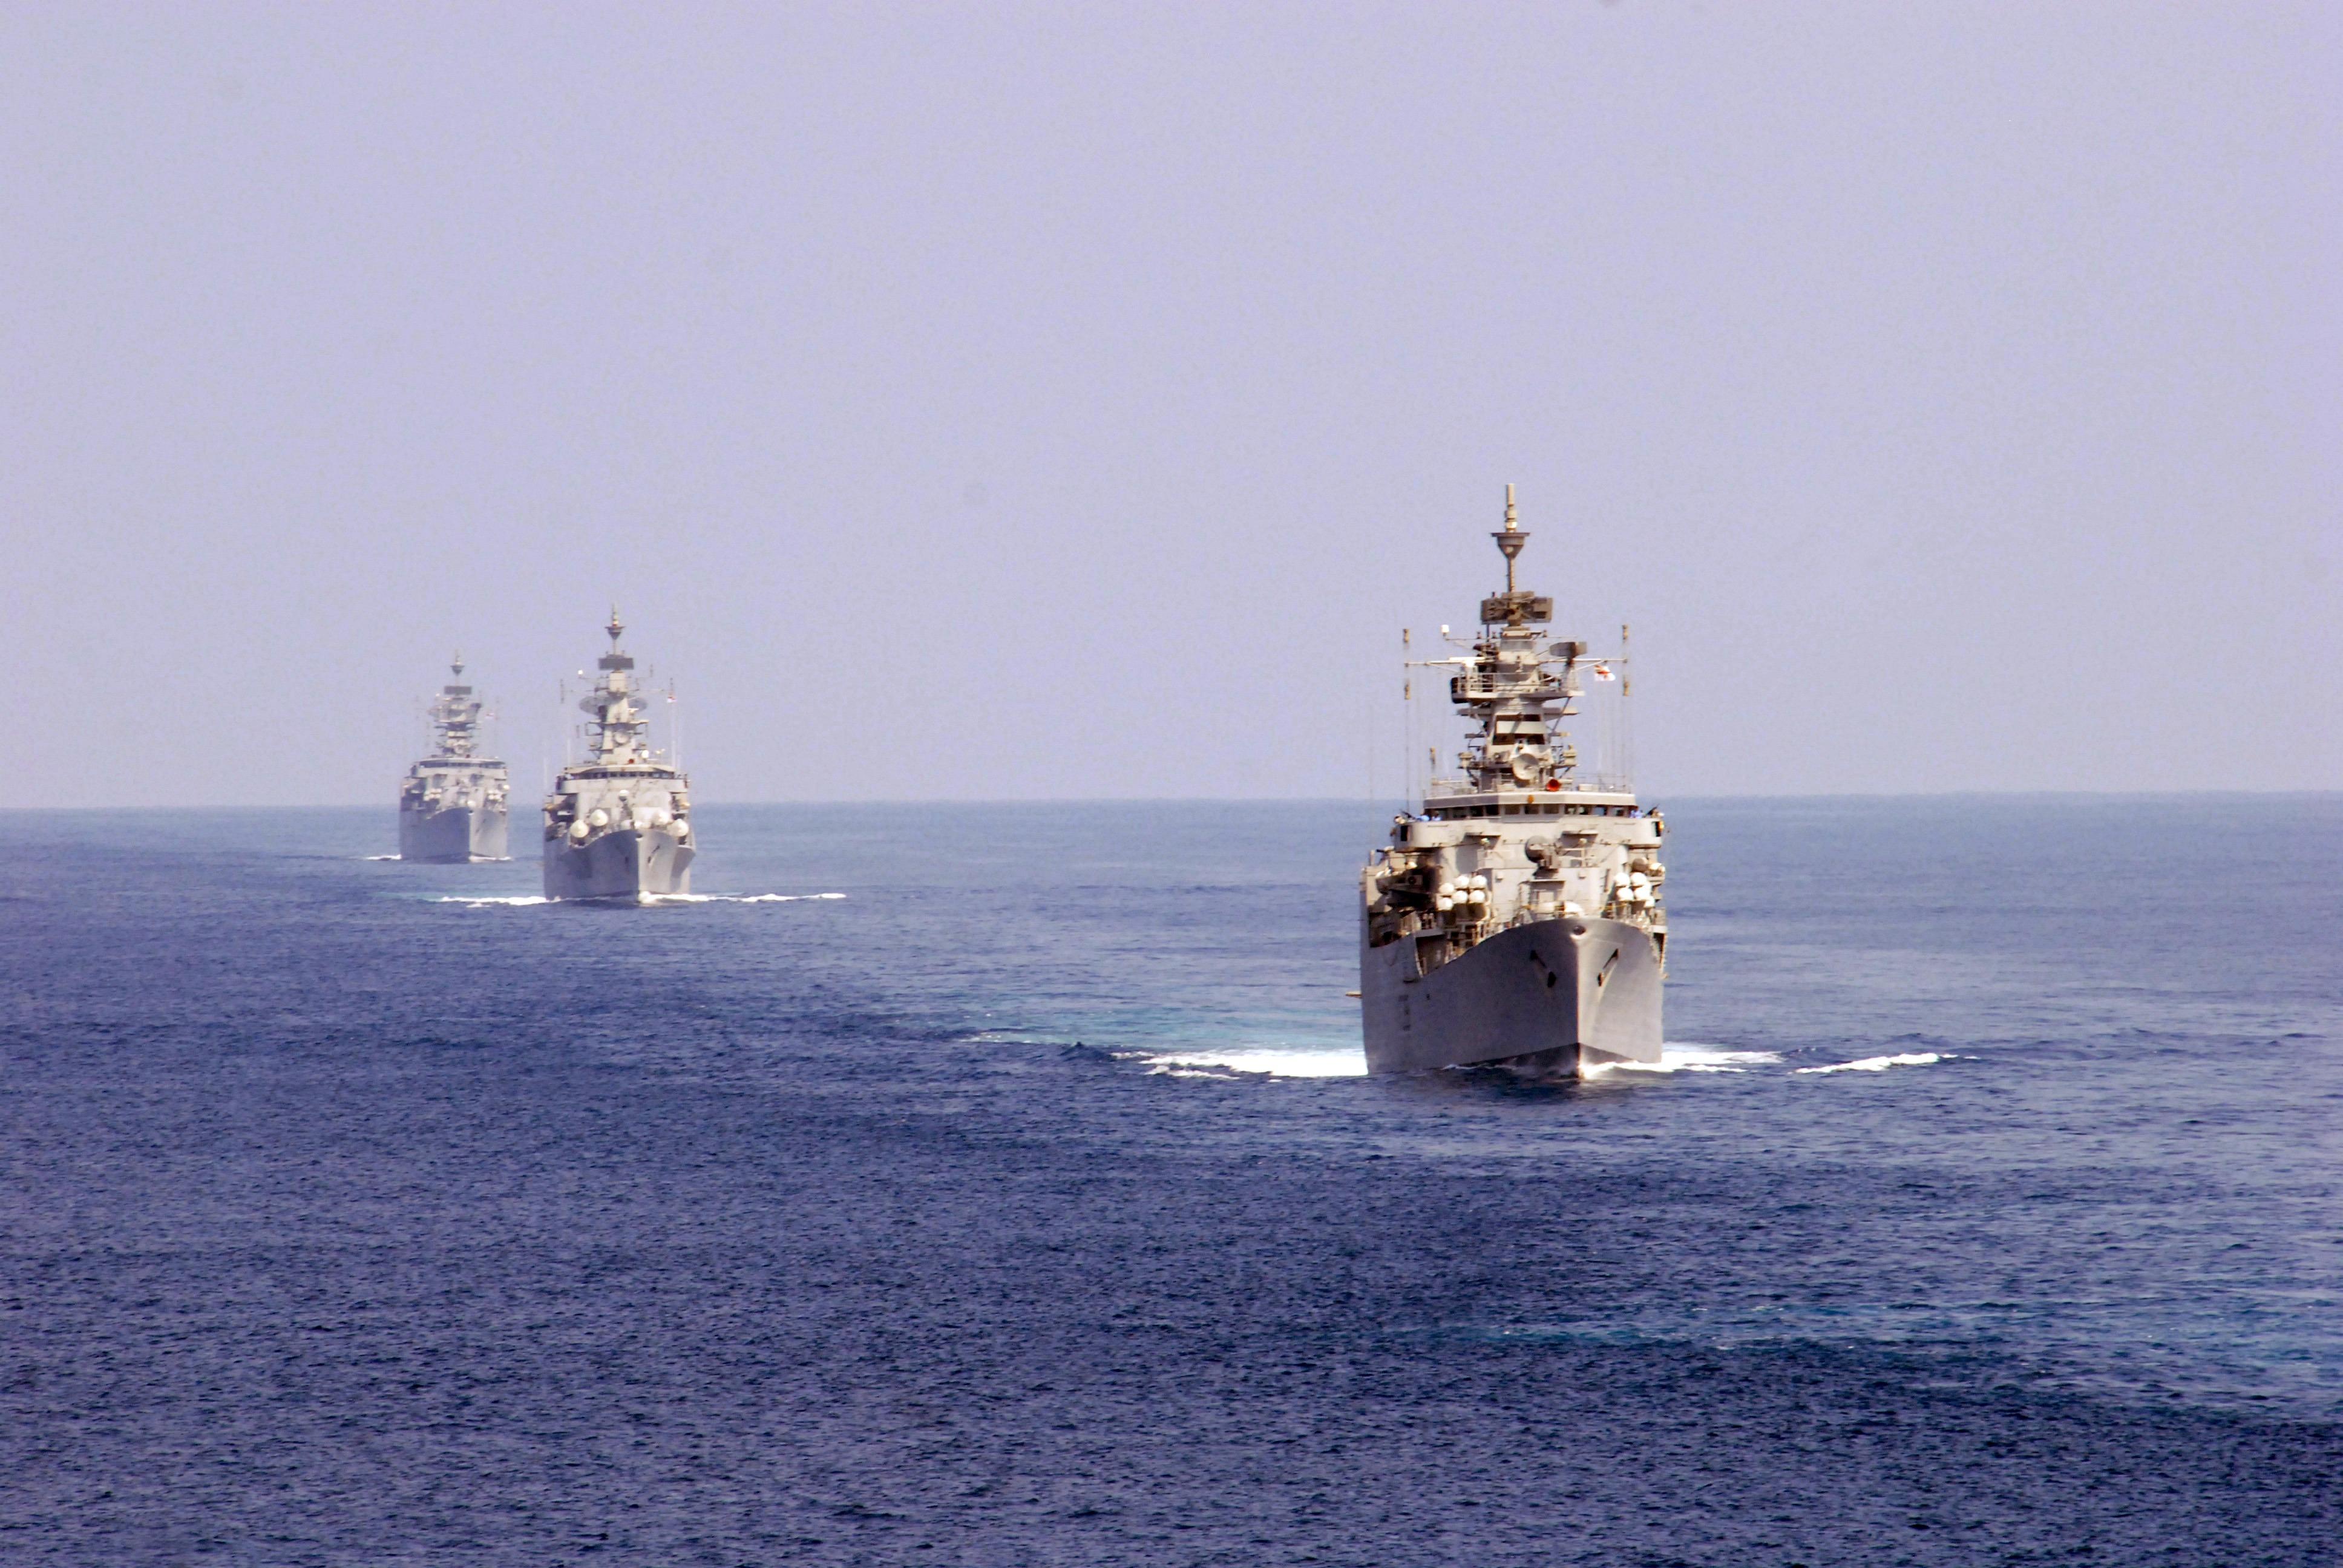 sea-ship-army-vehicle-tower-navy-1357587-pxhere.com